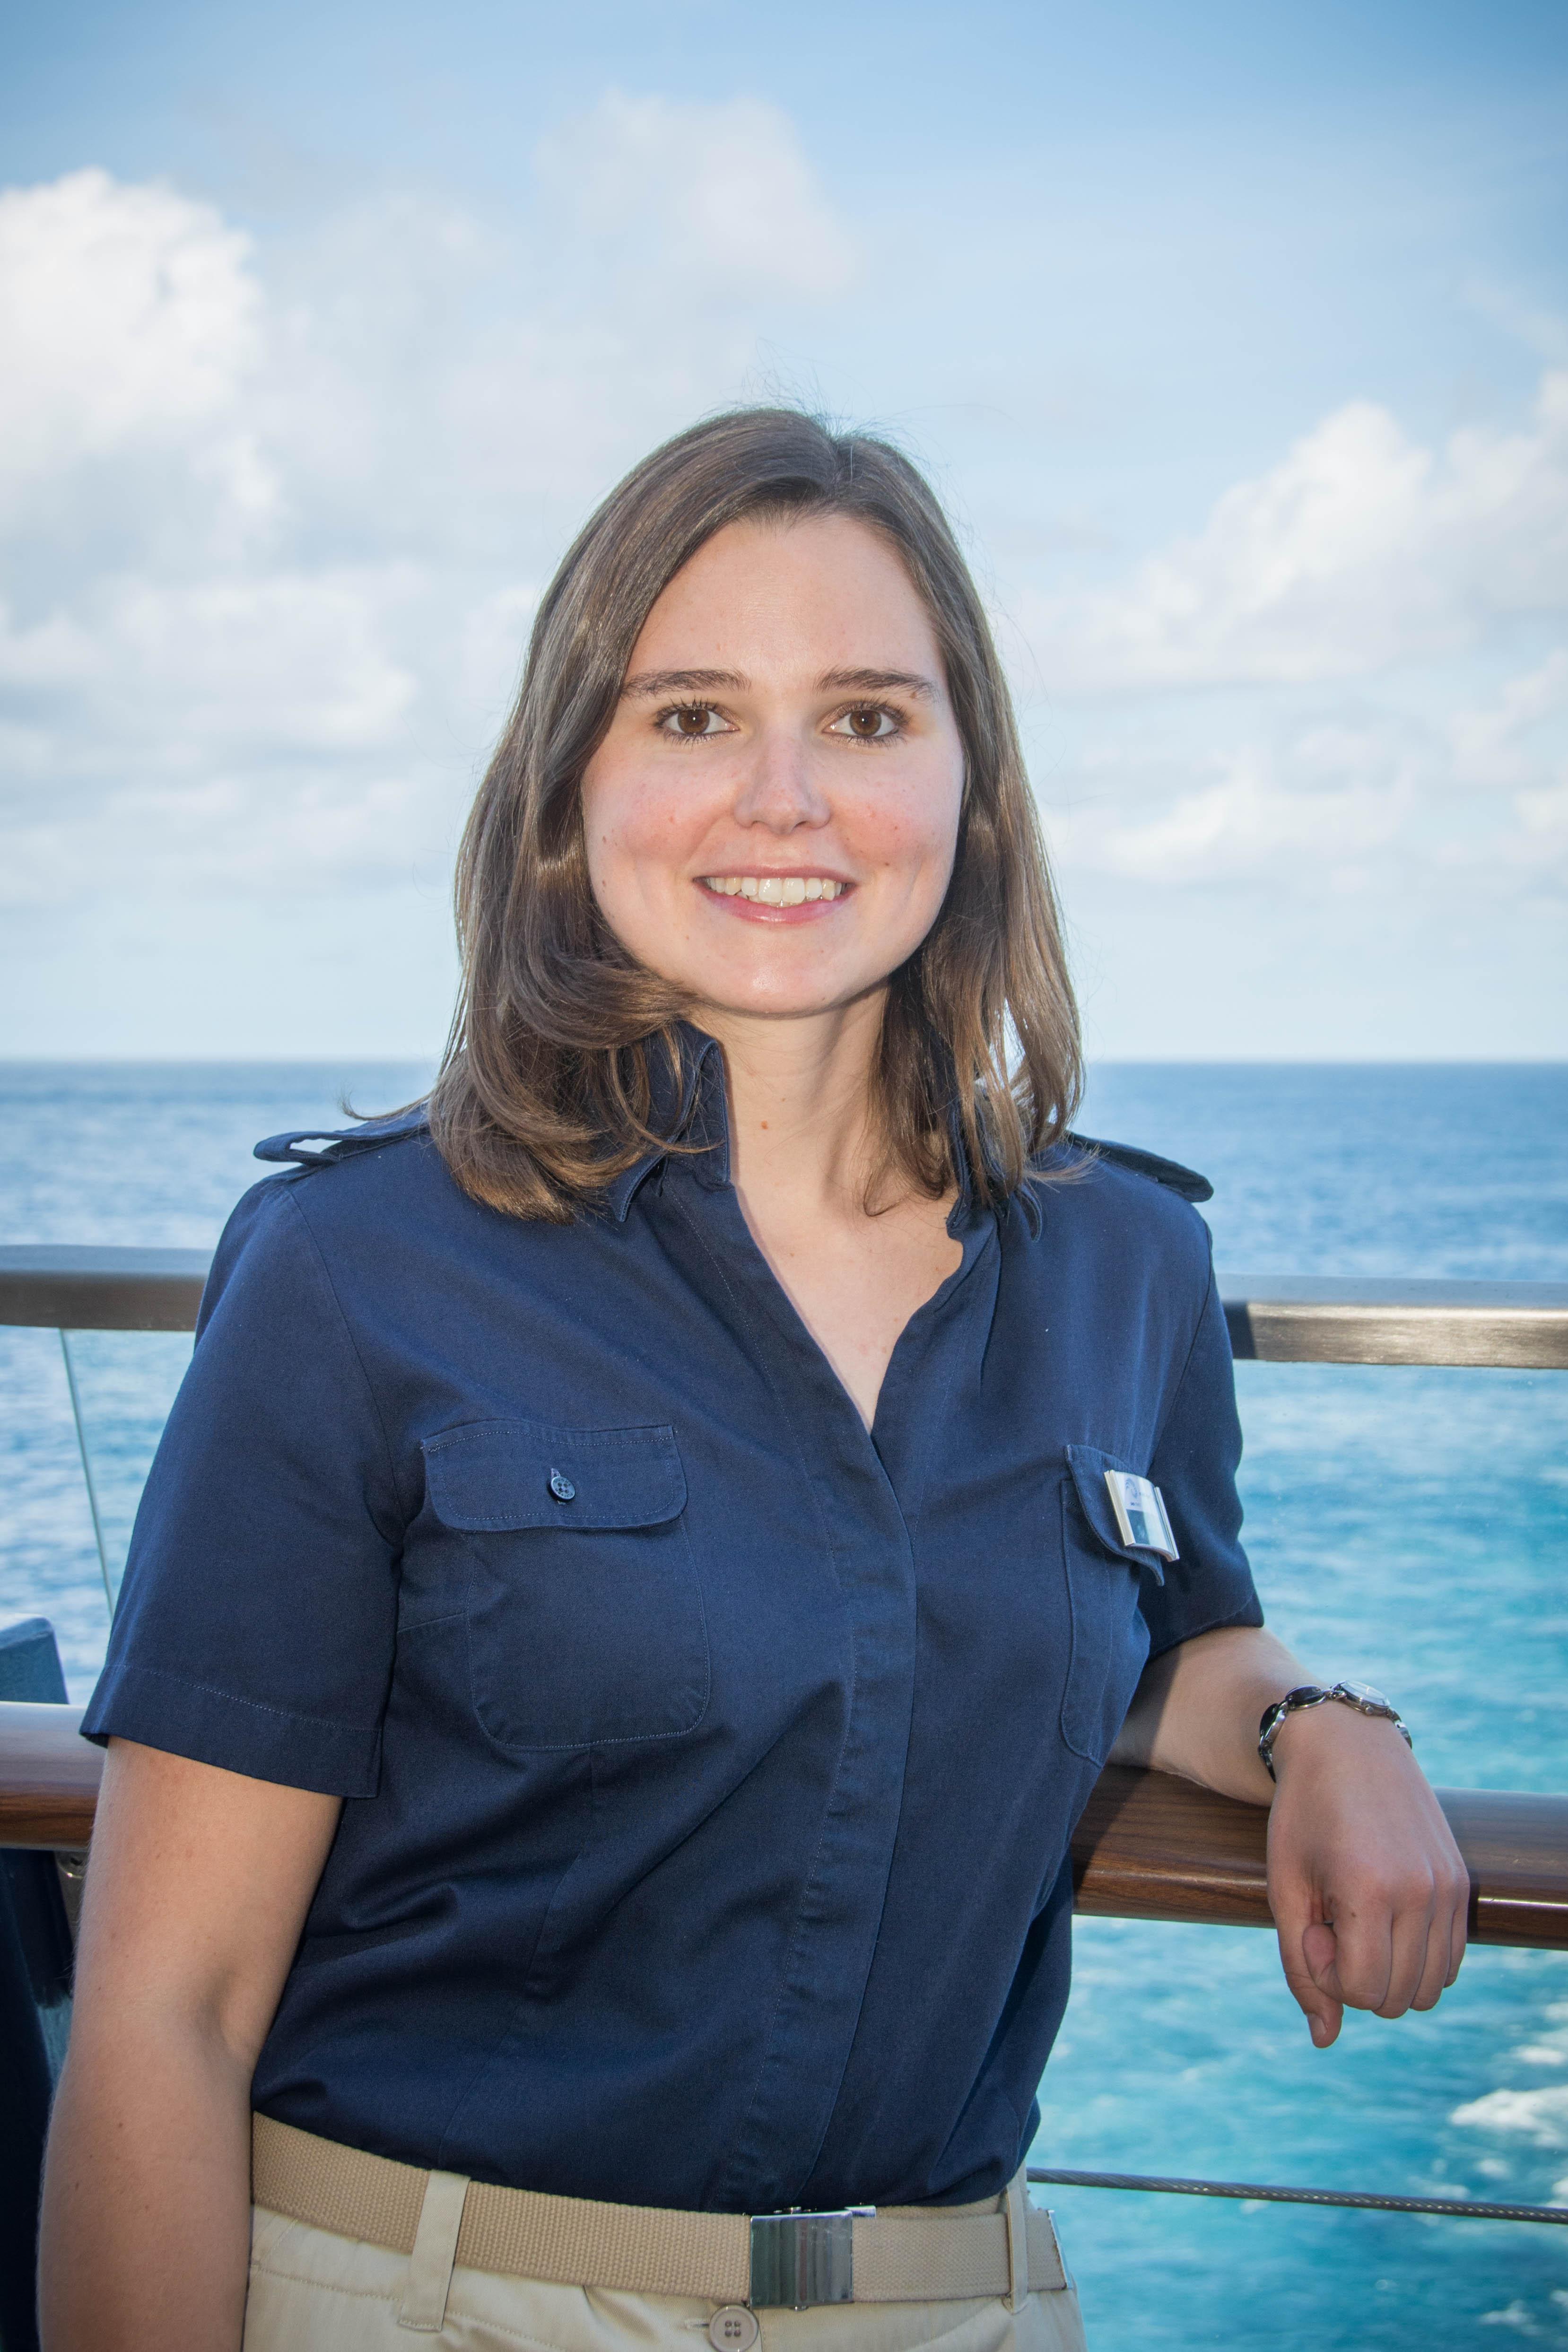 Mein Schiff Ausflugsexpertin Lena Engels